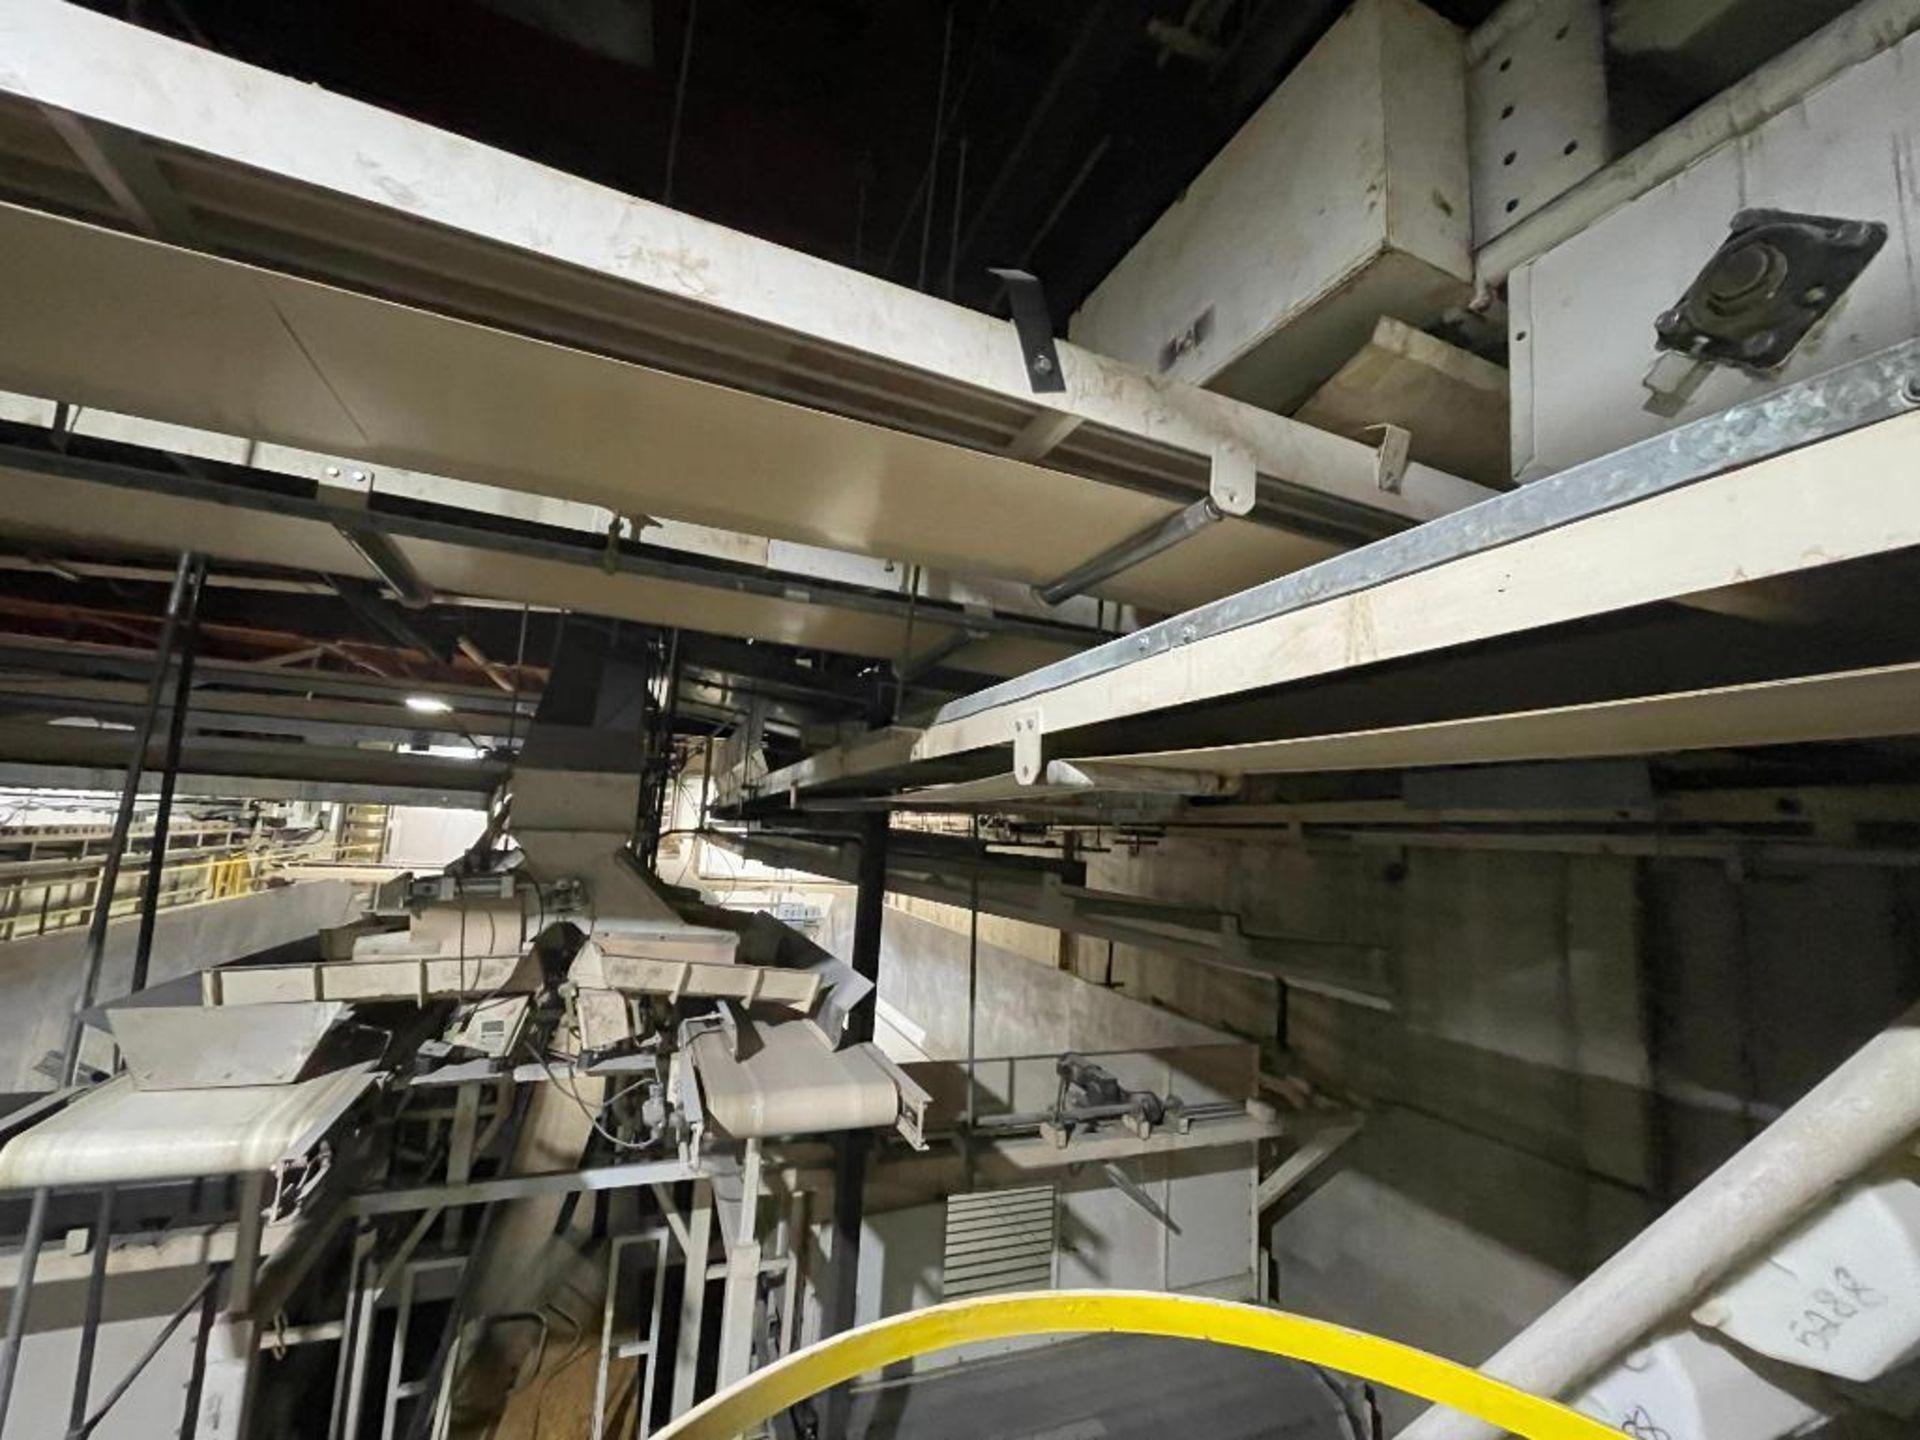 2 Aseeco horizontal overhead mild steel belt conveyors - Image 6 of 9